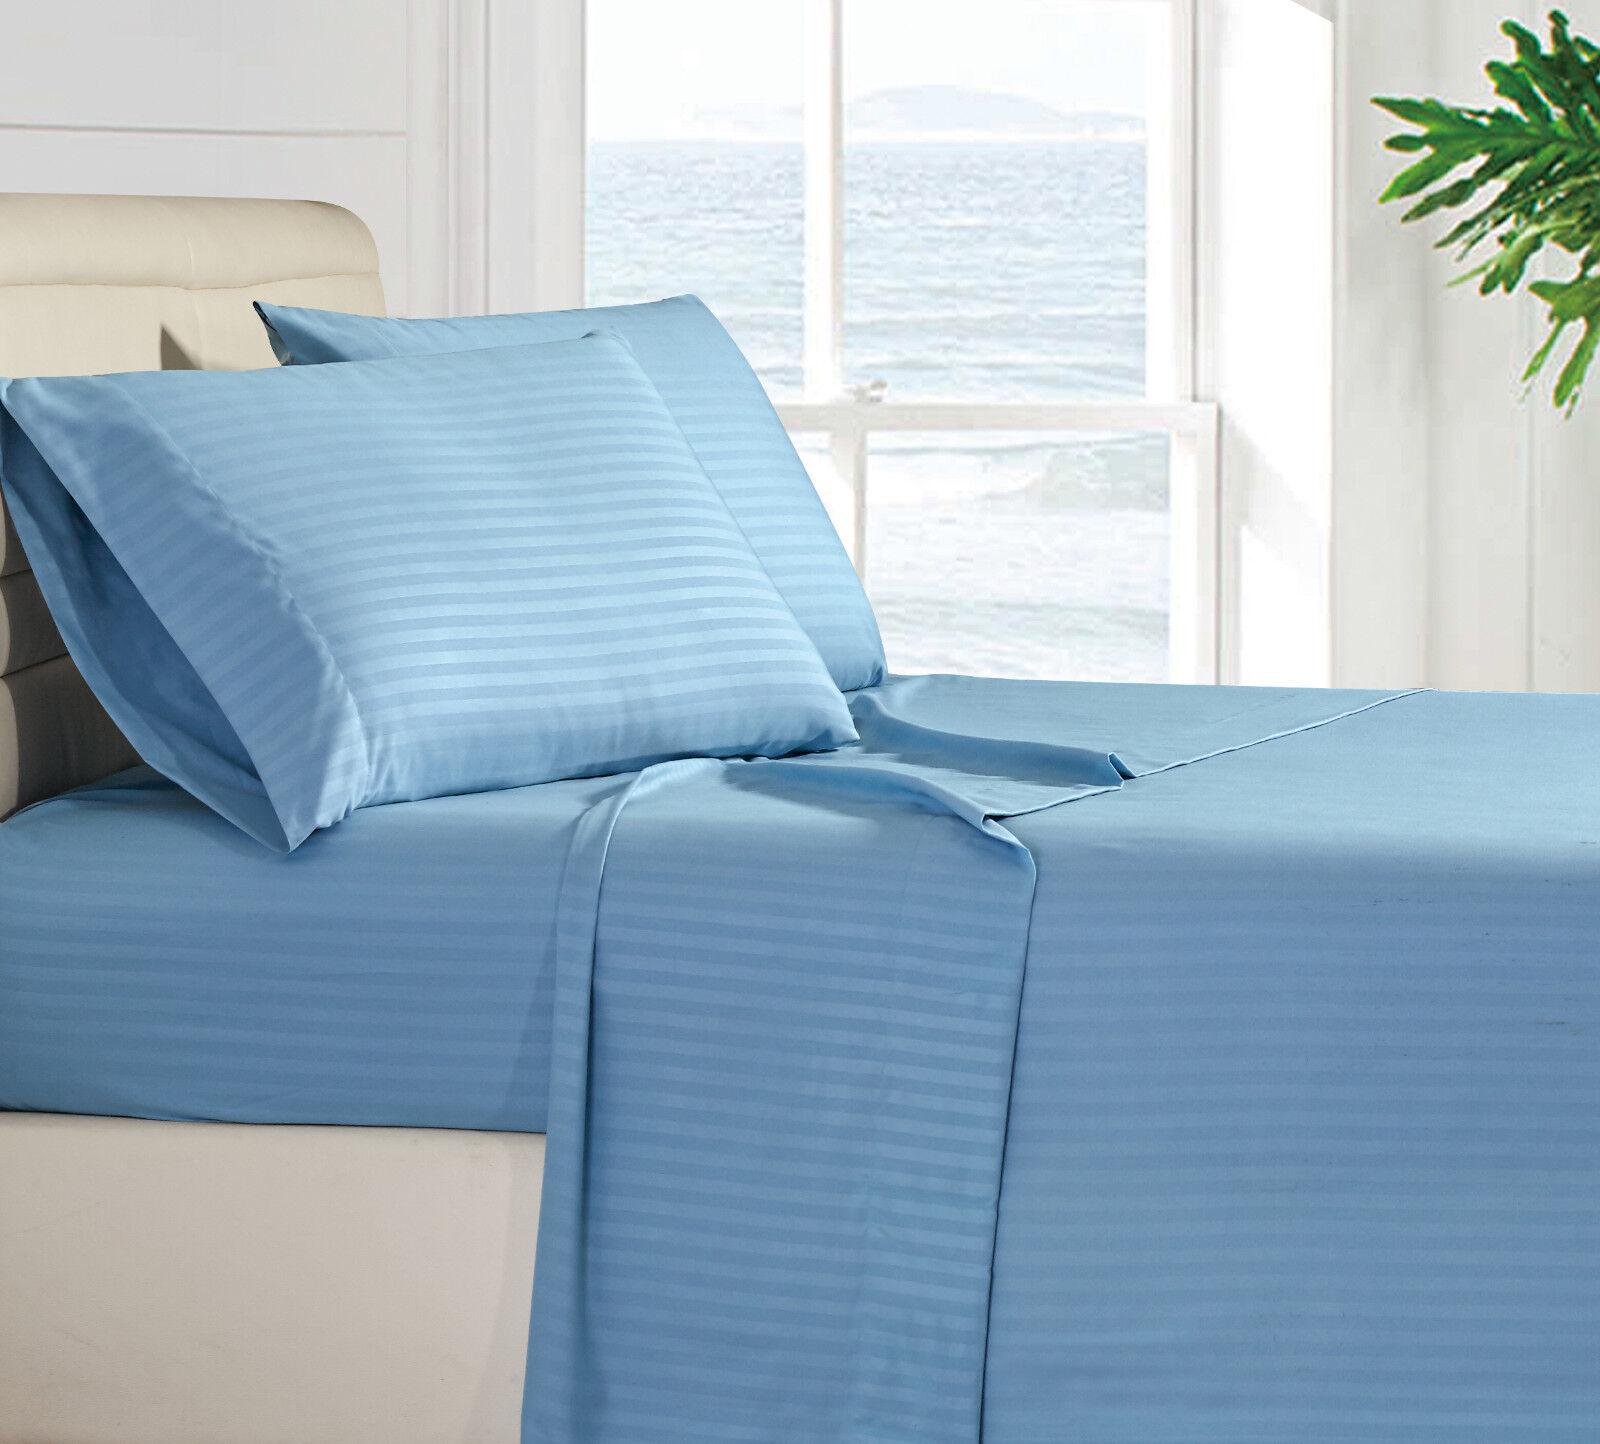 Egyptian Comfort 1800 Thread Count Bed Sheet Set - 4 Piece Deep Pocket 11 Colors